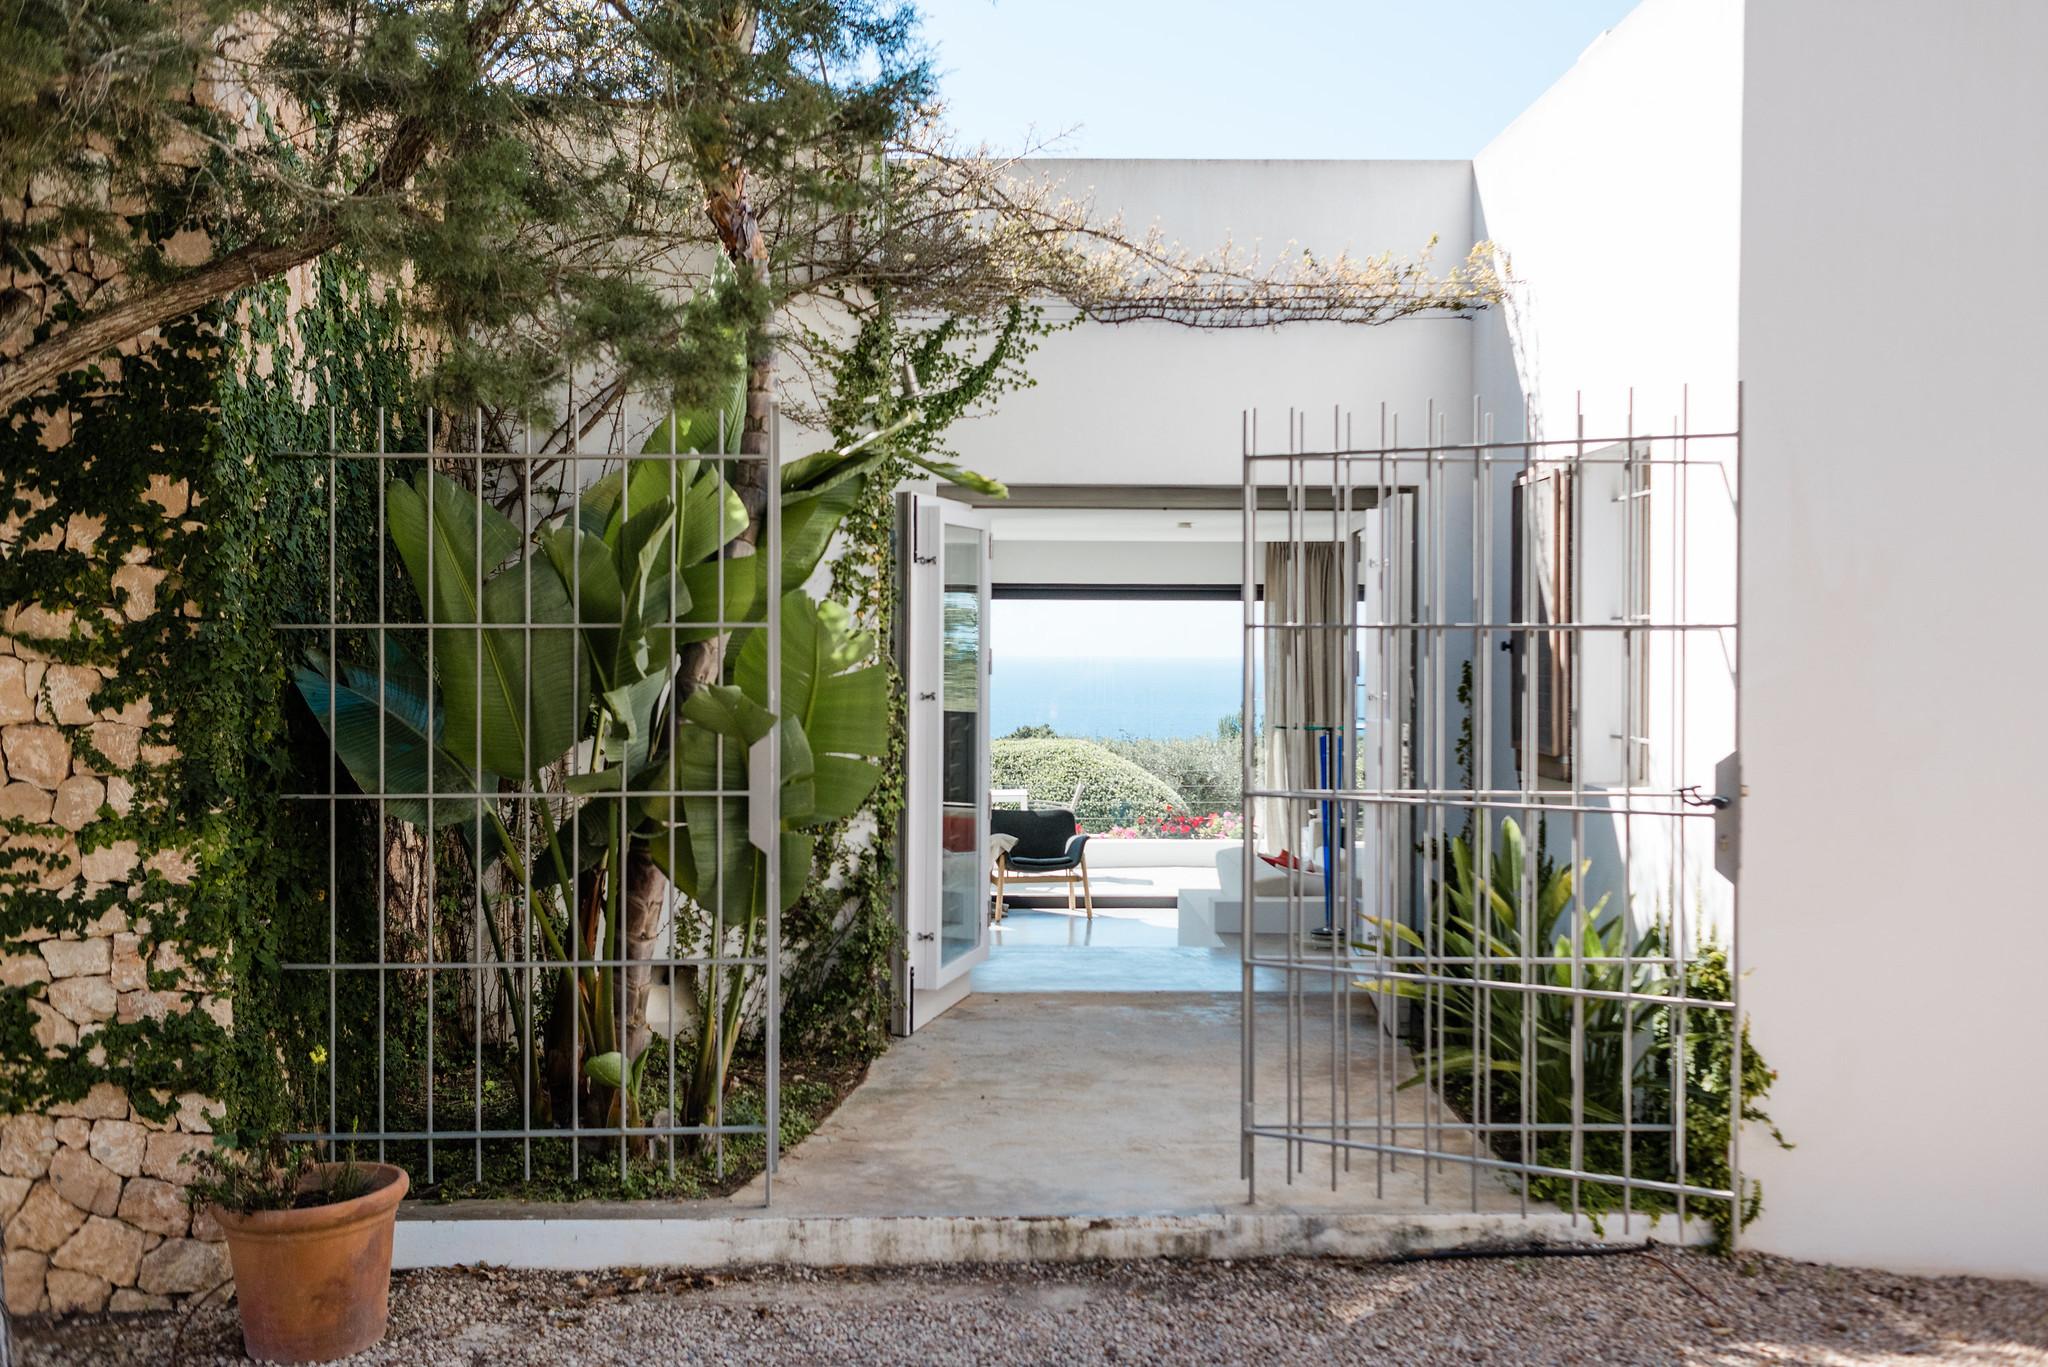 https://www.white-ibiza.com/wp-content/uploads/2020/06/white-ibiza-villas-casa-nyah-exterior-entrance.jpg